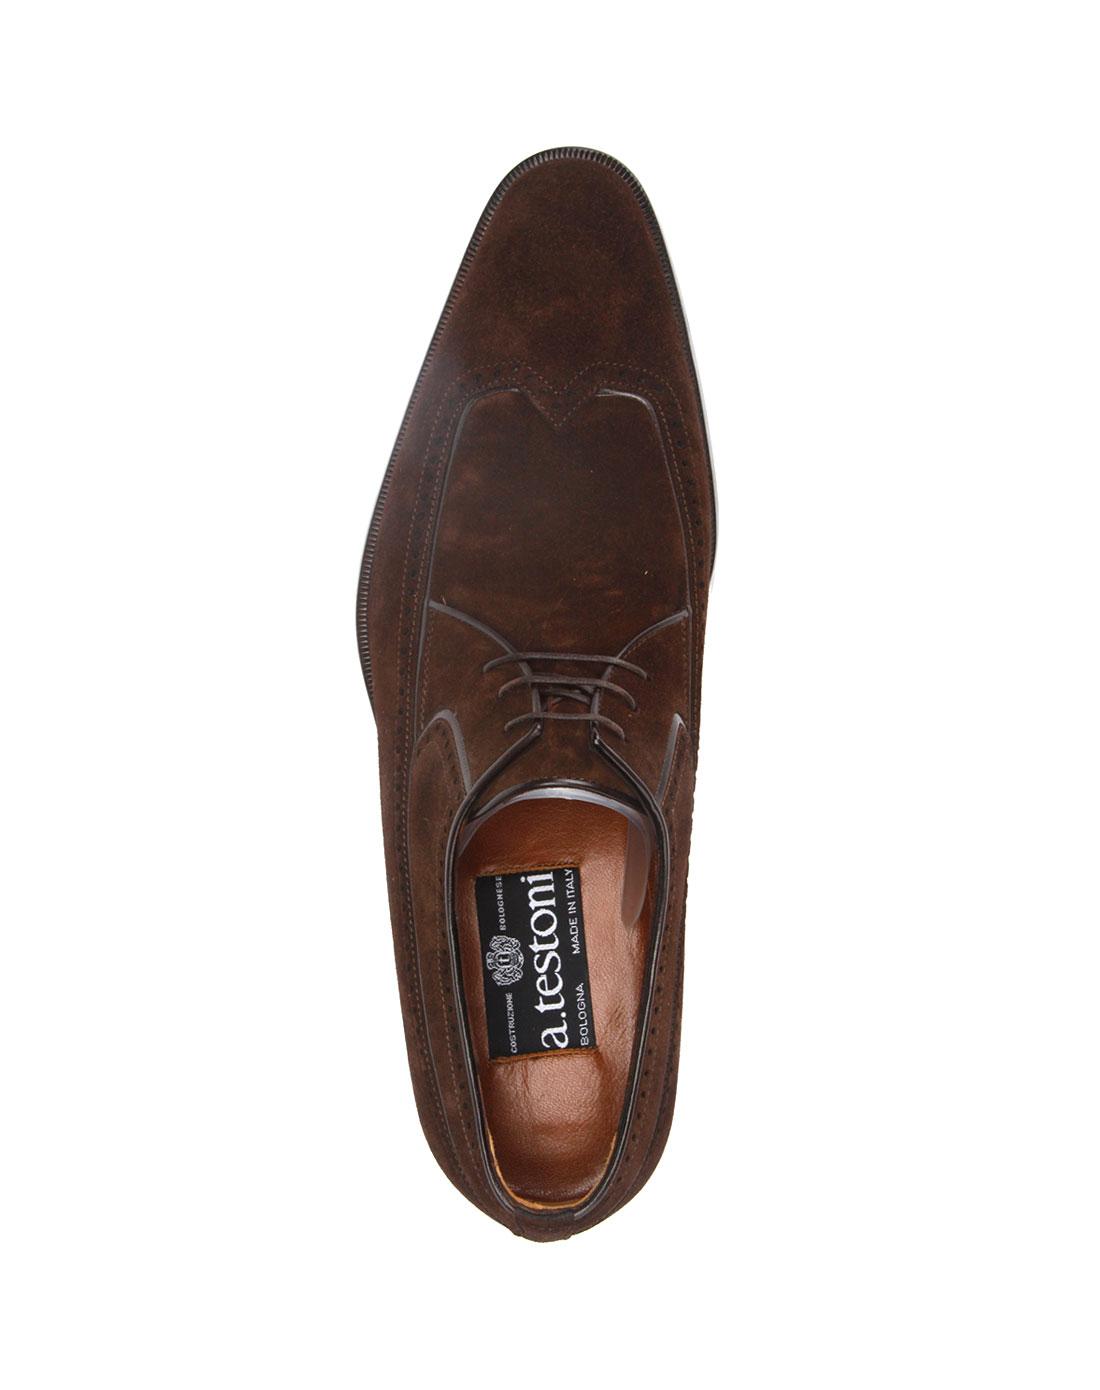 testoni男款褐色绒面皮鞋2